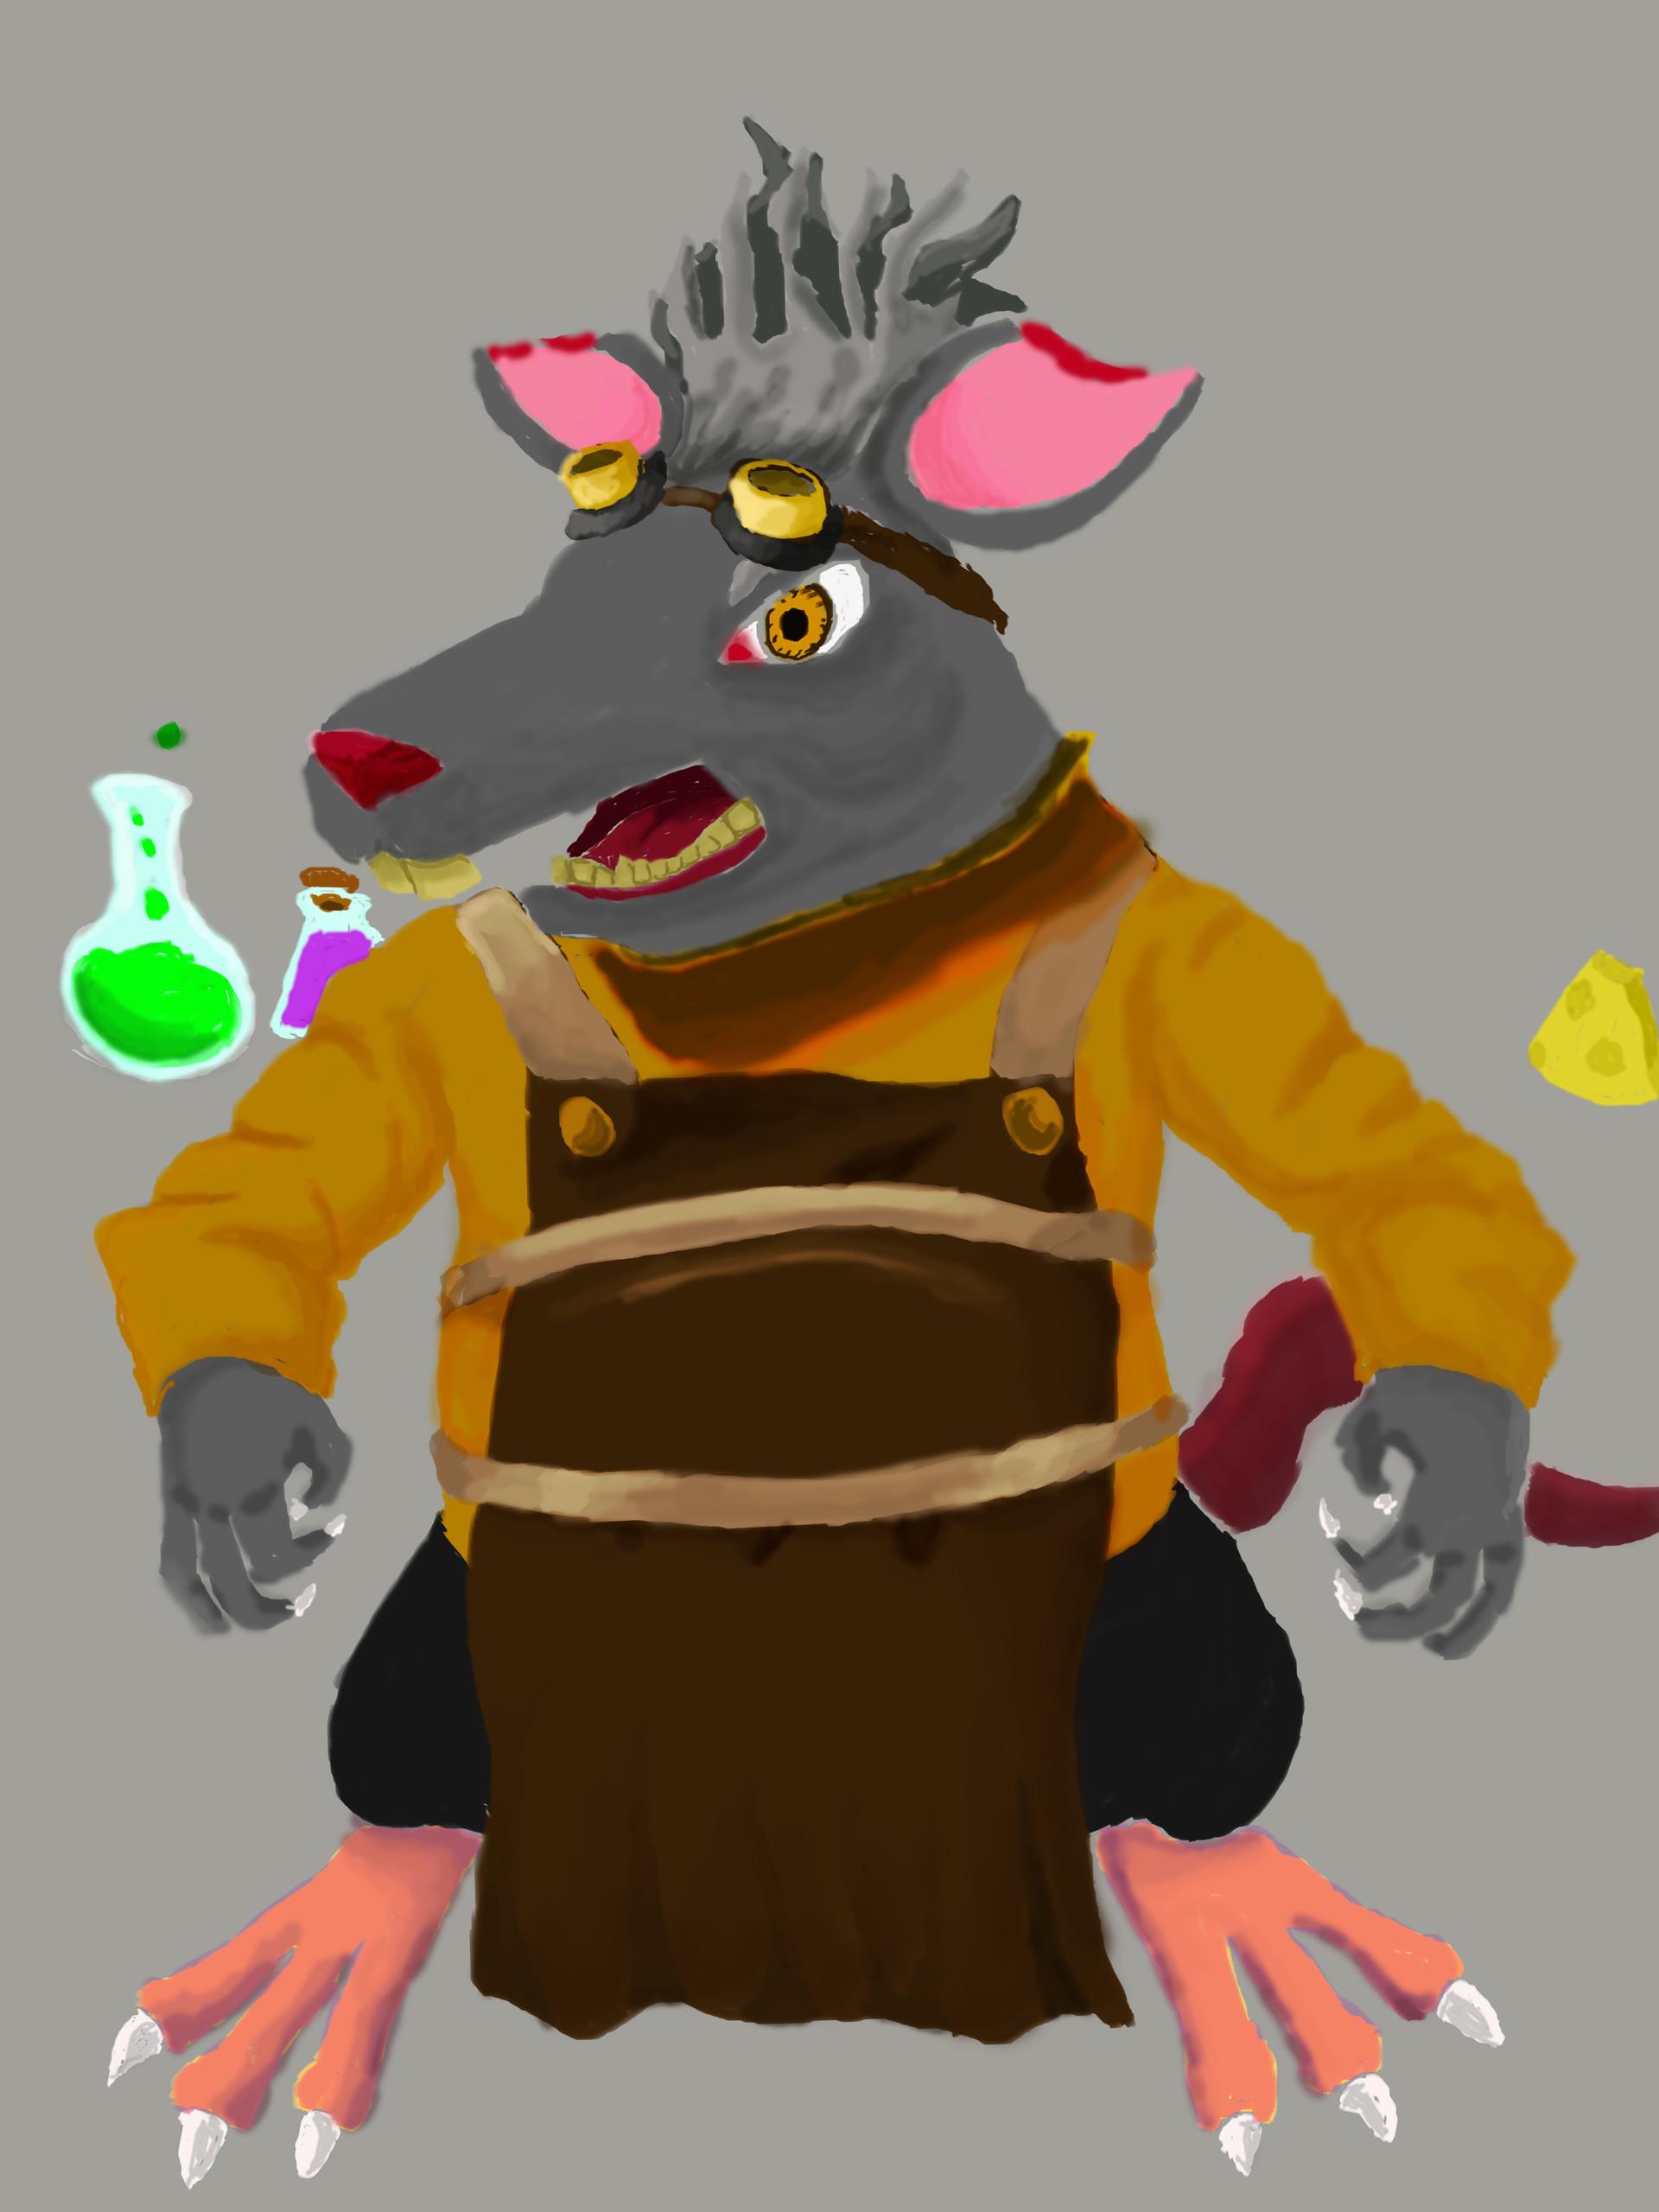 Mitchell sisson rat scienctist 2